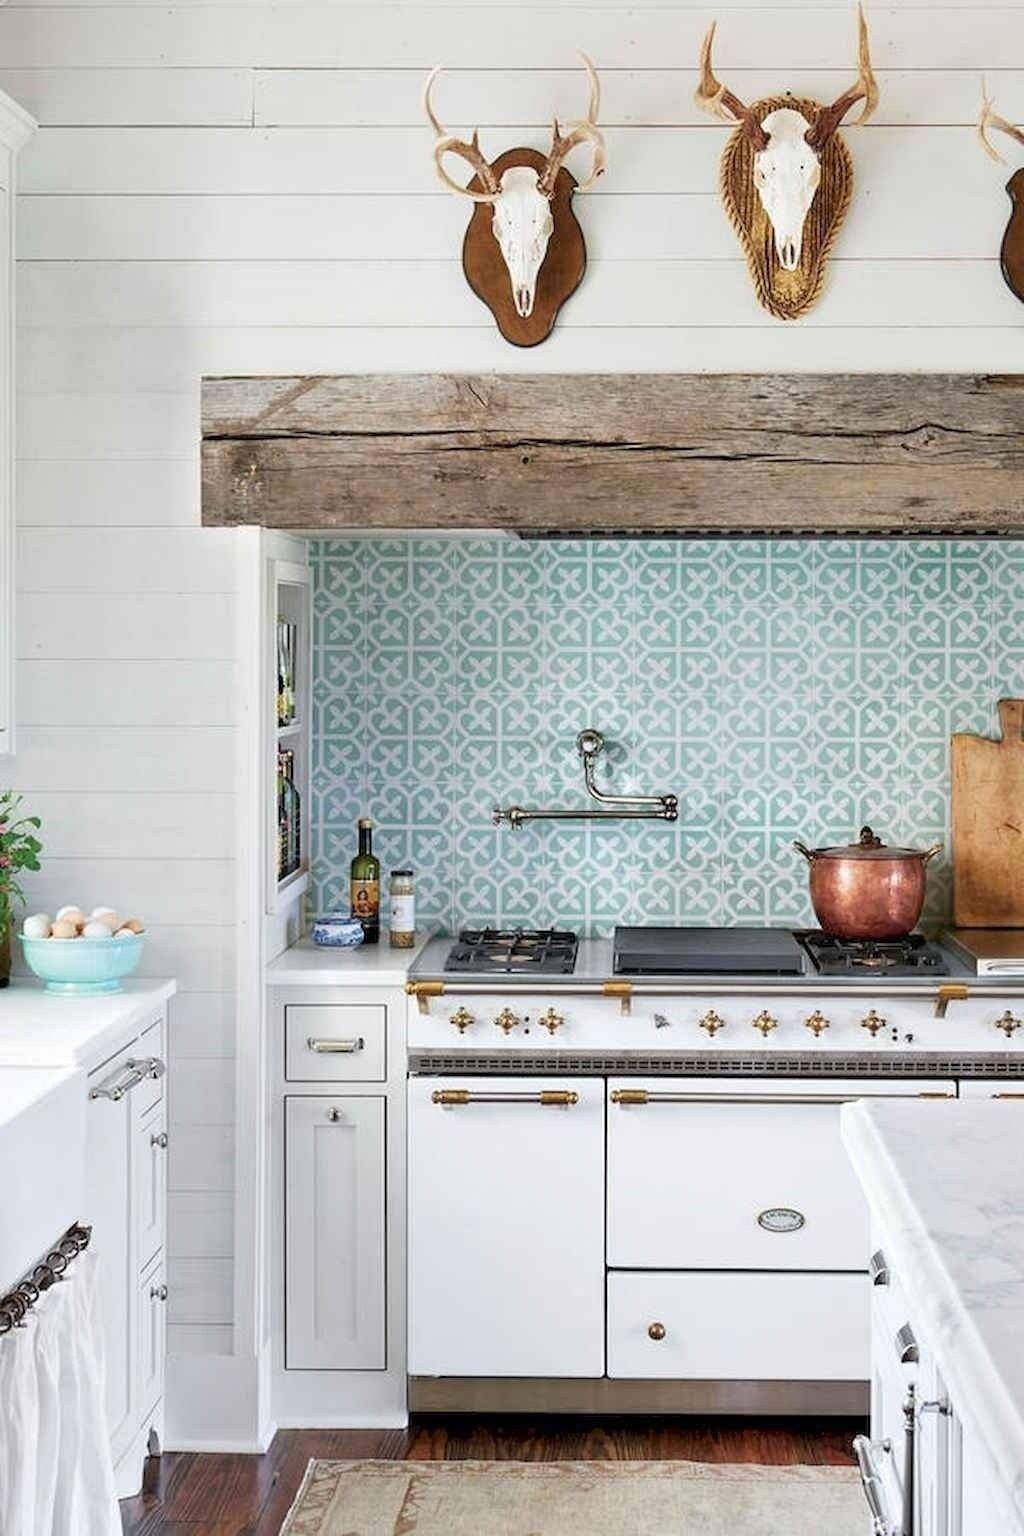 39 Inspiring Modern Farmhouse Kitchen Backsplash Ideas Farmhouse Style Kitchen Farmhouse Kitchen Backsplash Kitchen Remodel